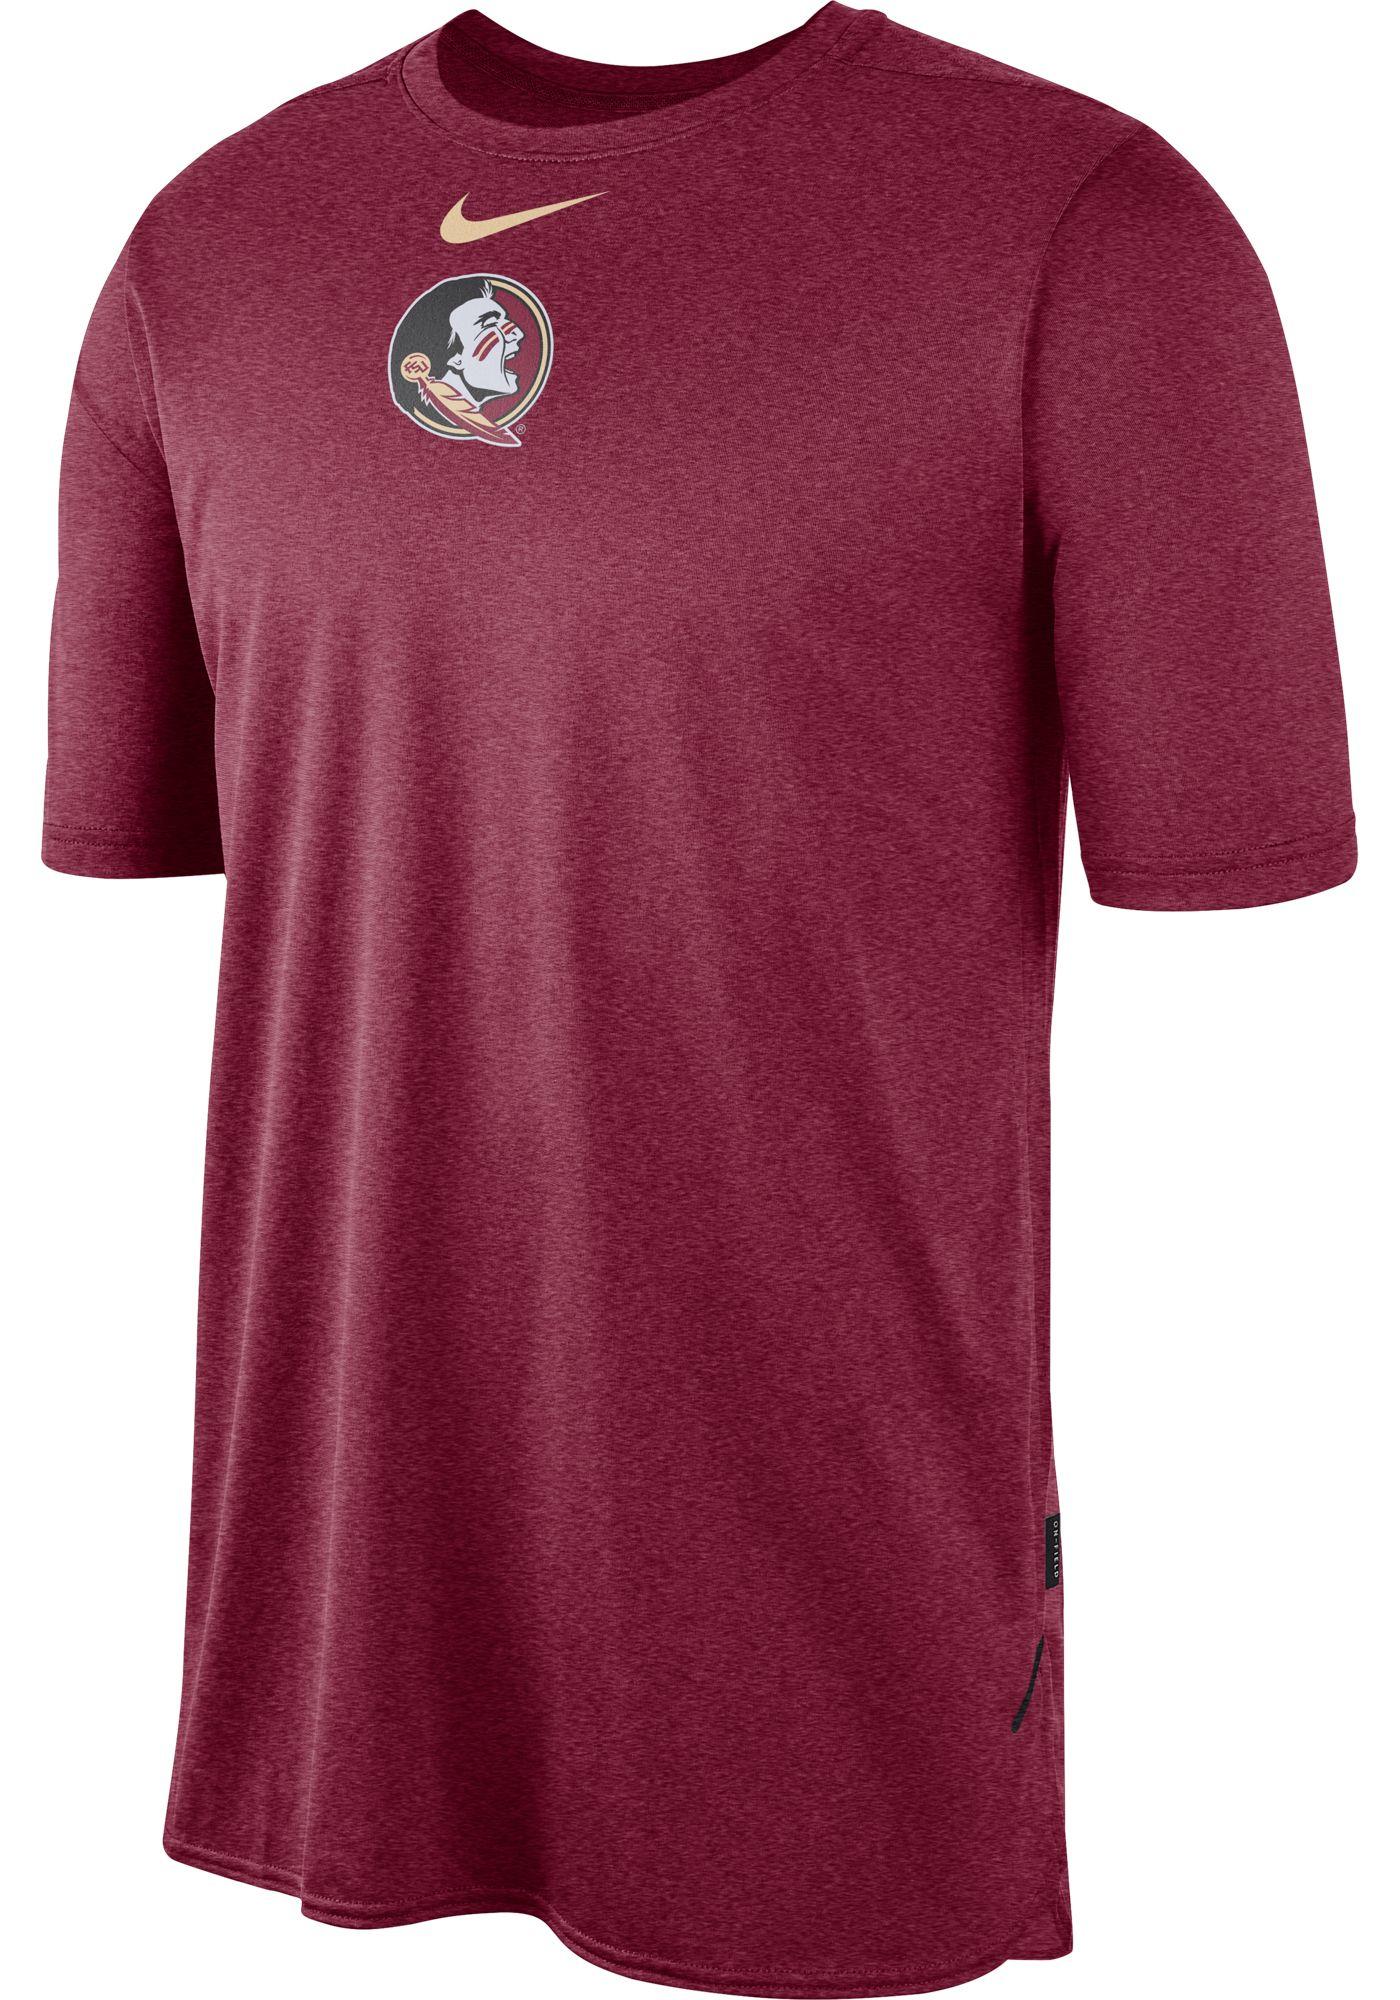 Nike Men's Florida State Seminoles Garnet Player Dri-FIT TechKnit T-Shirt